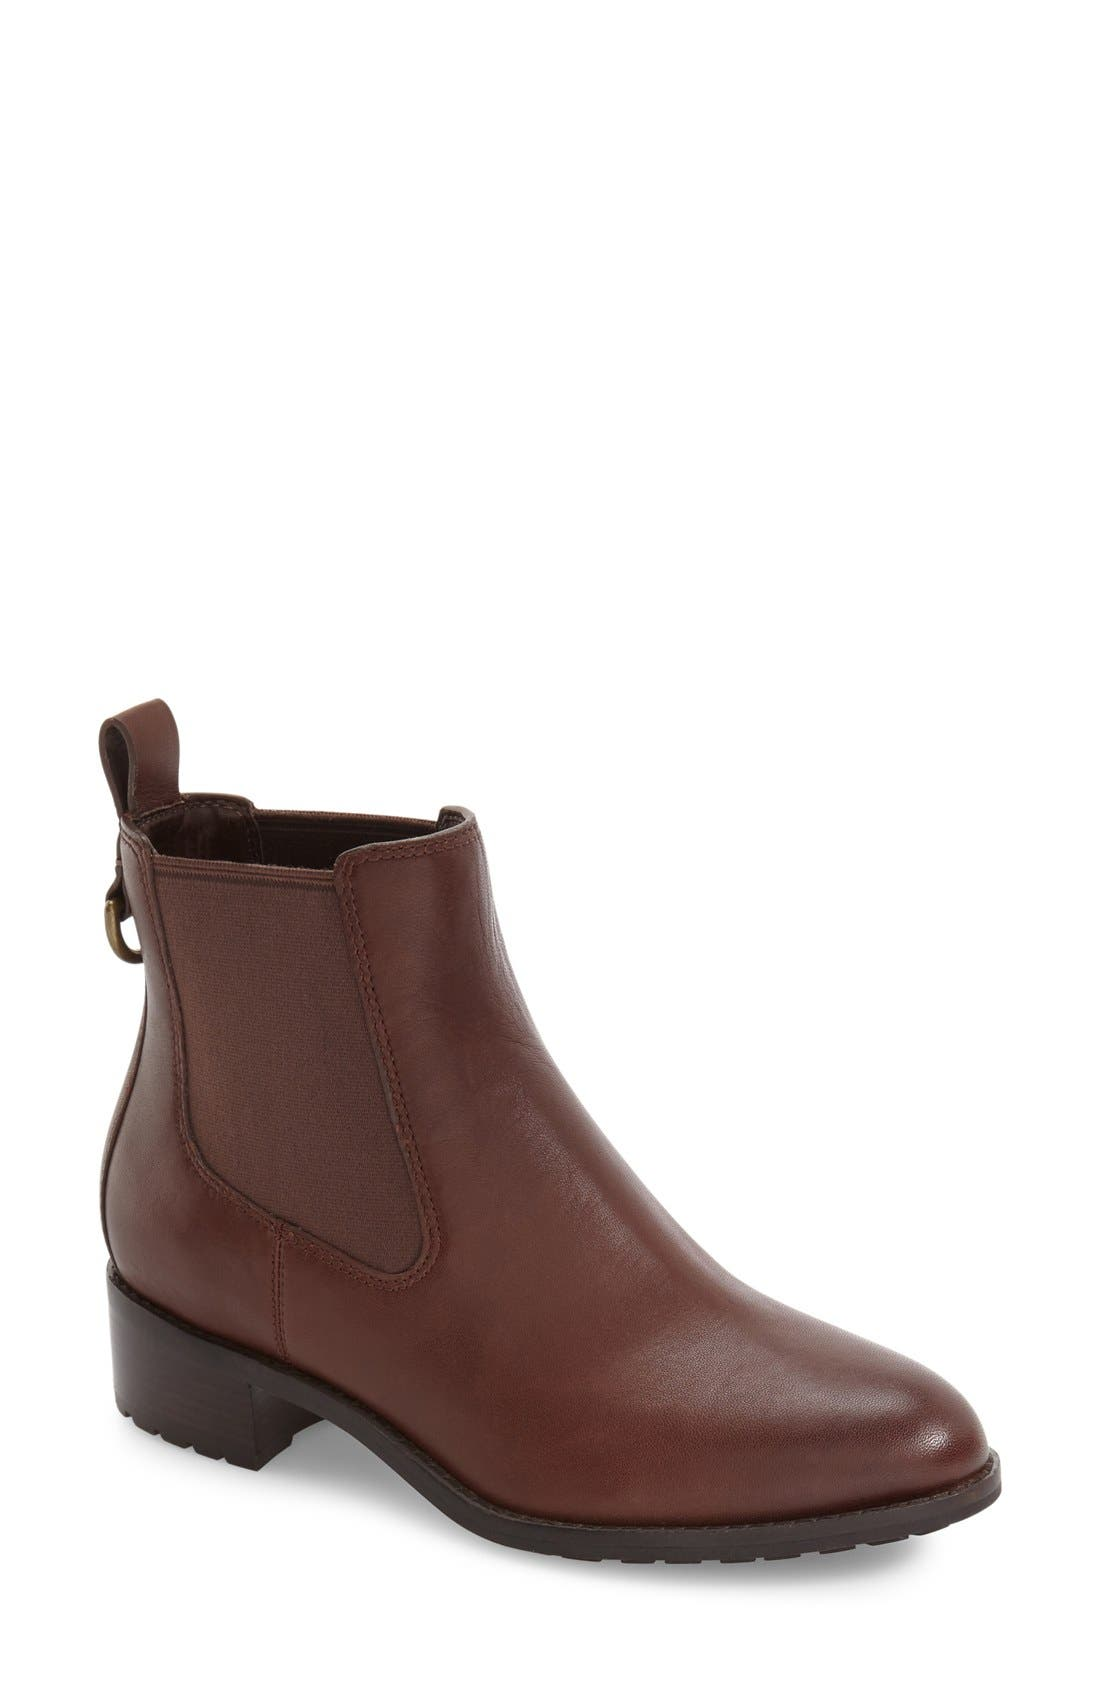 Alternate Image 1 Selected - Cole Haan 'Newburg' Waterproof Chelsea Boot (Women)